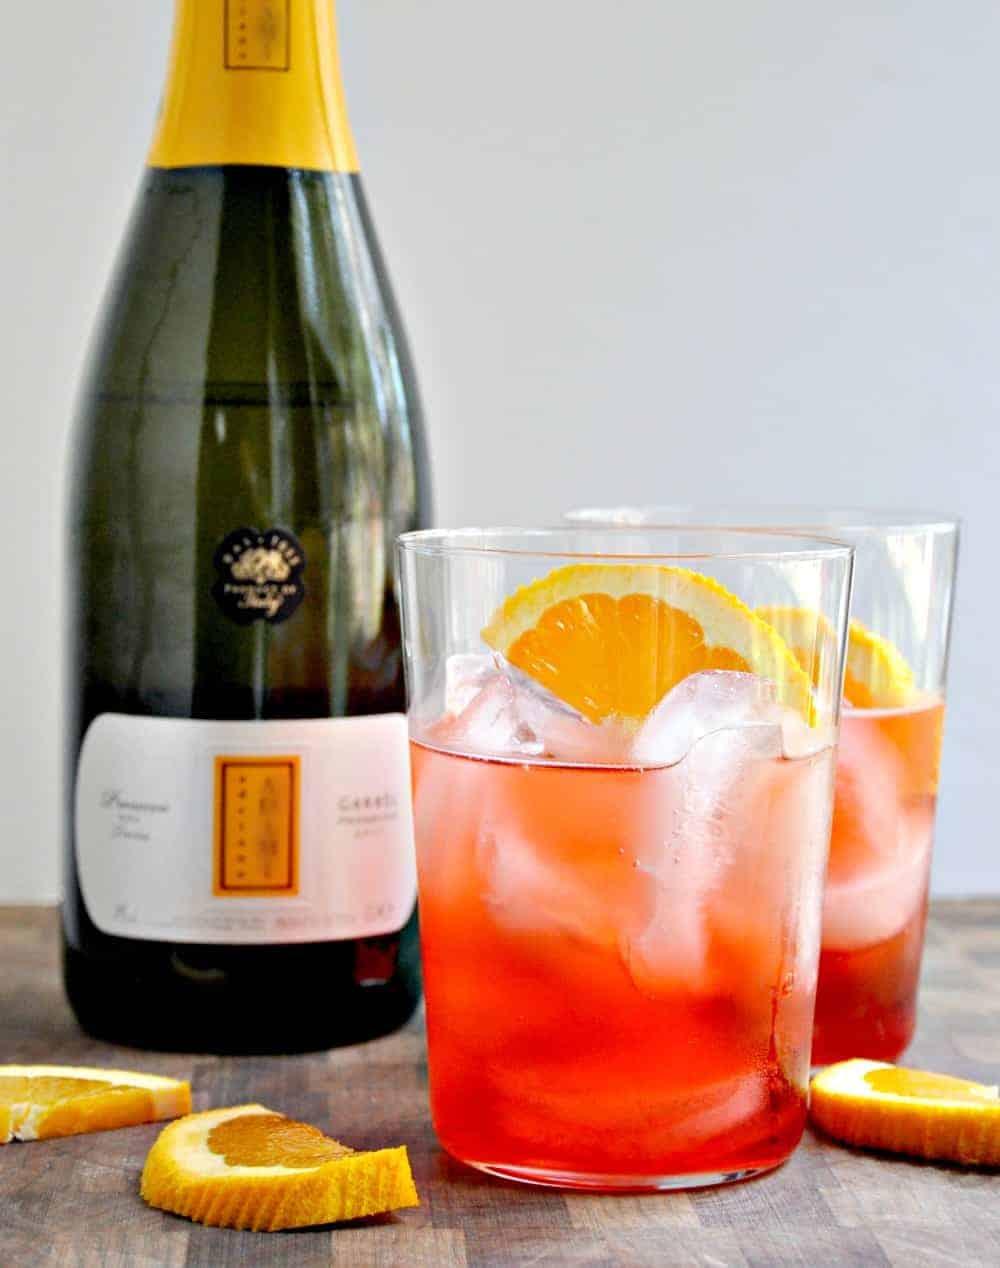 Campari Spritz served in clear glasses with orange slices